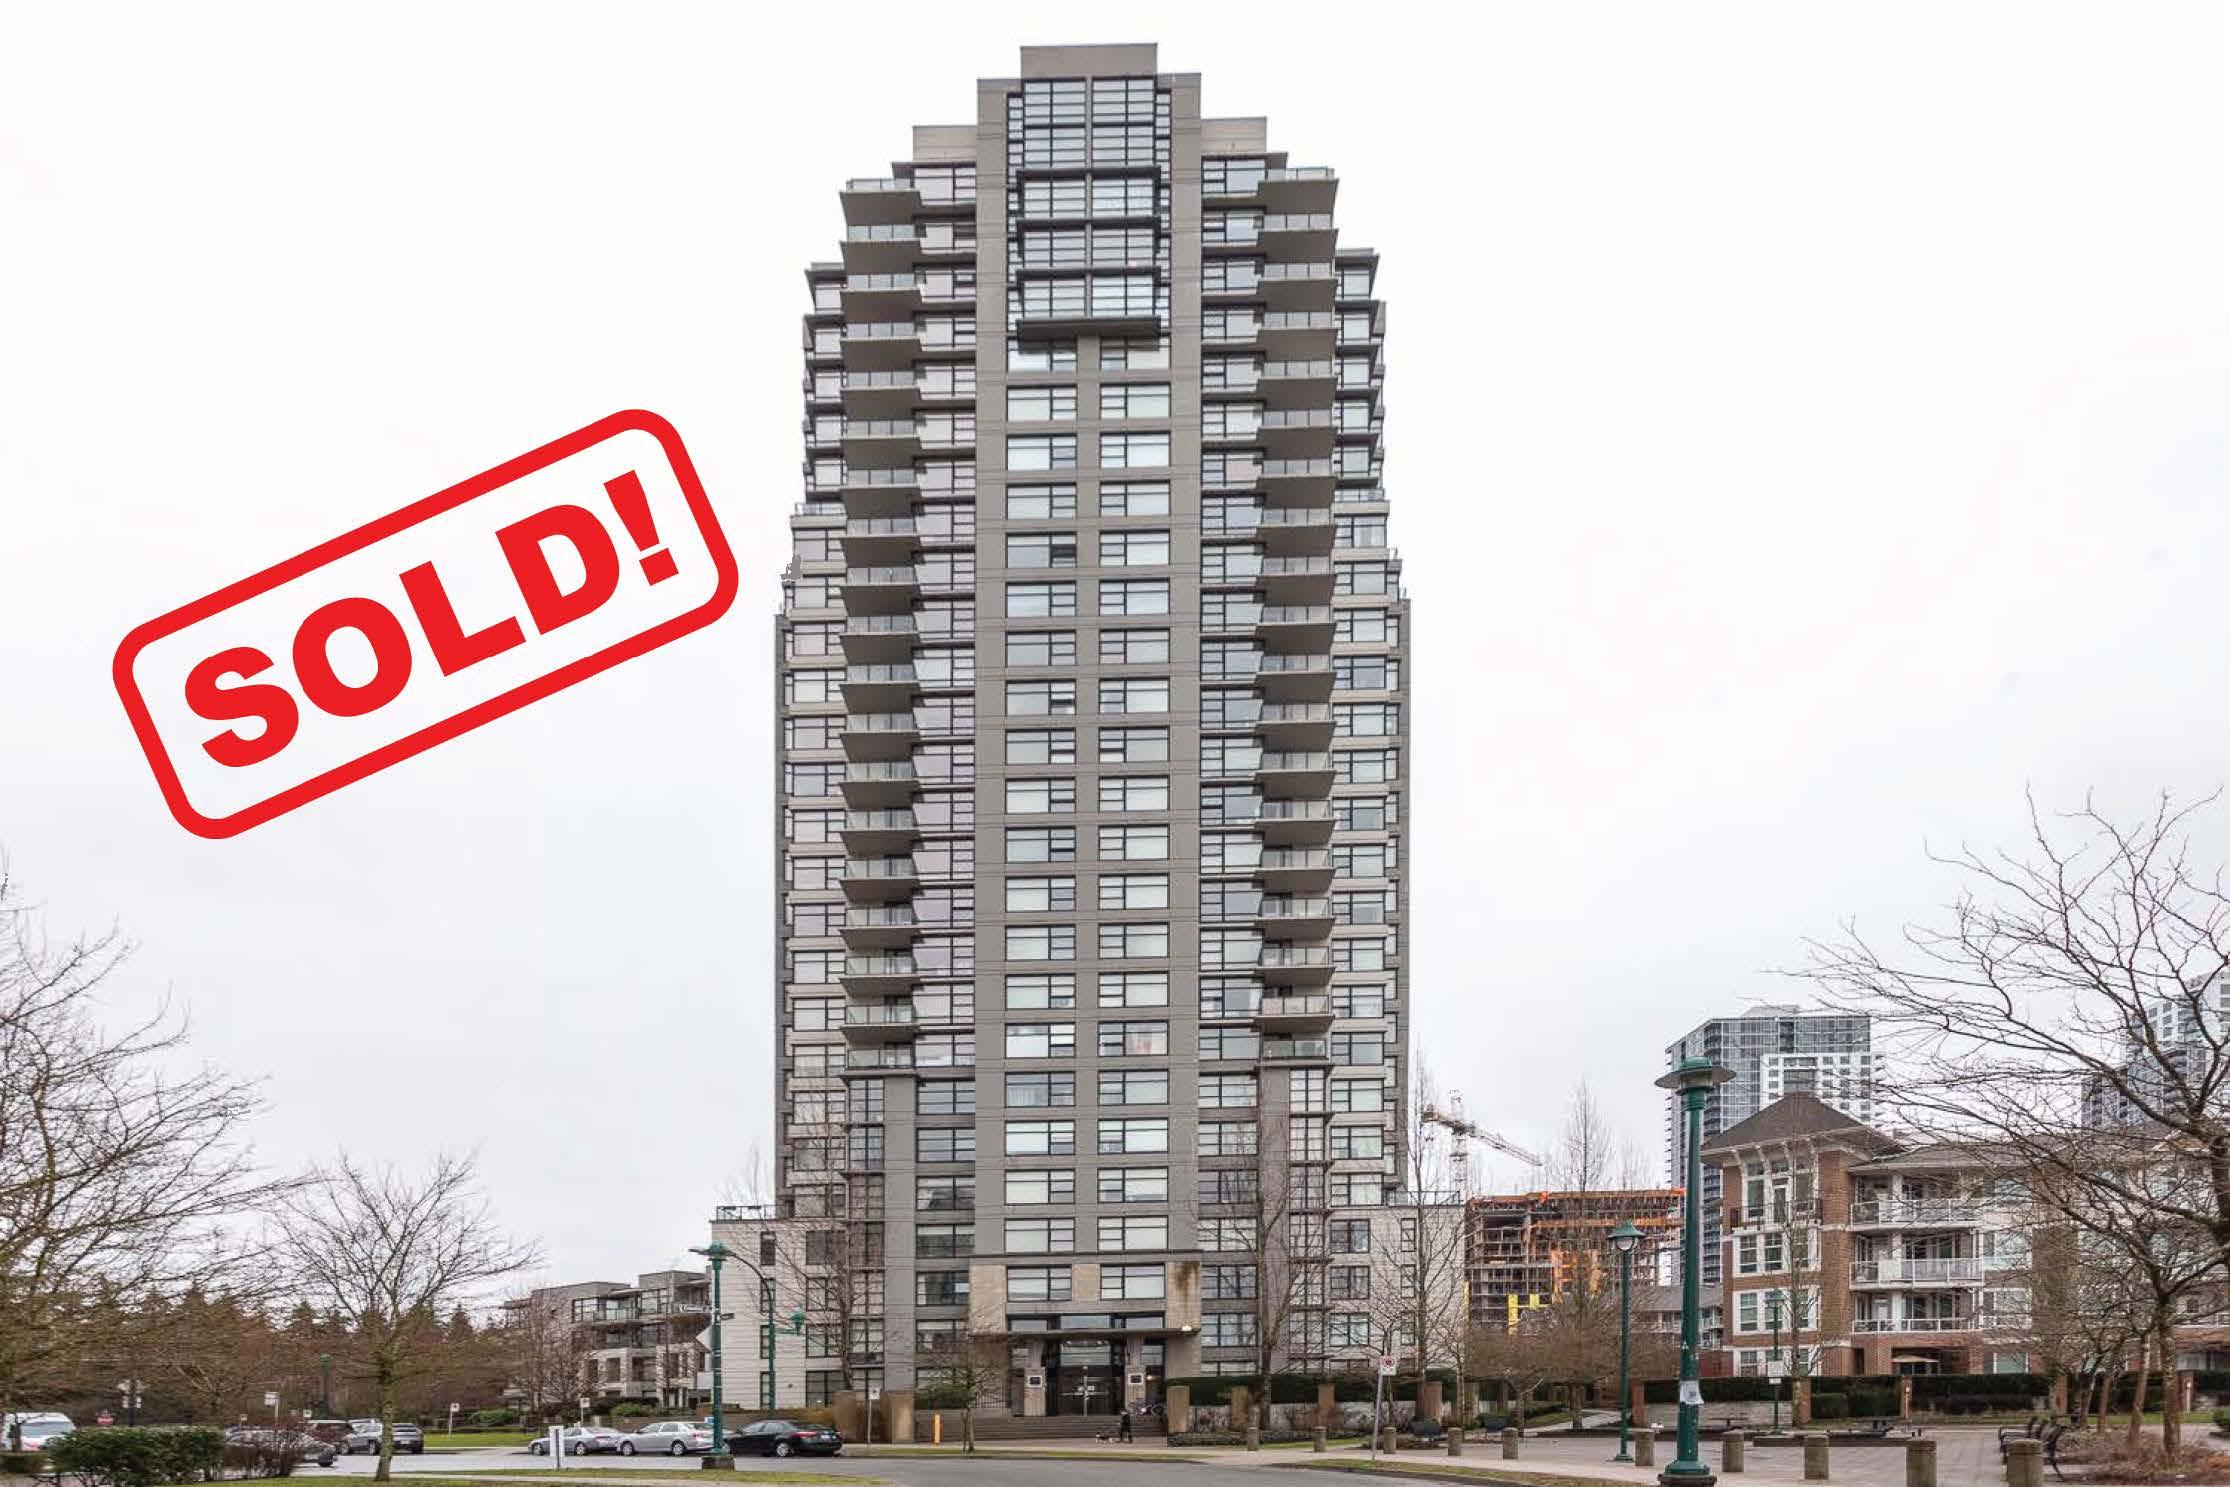 1101-5380 Oben Street   sold for: $400,000  1 Bed | 1 Bath | 574 SF